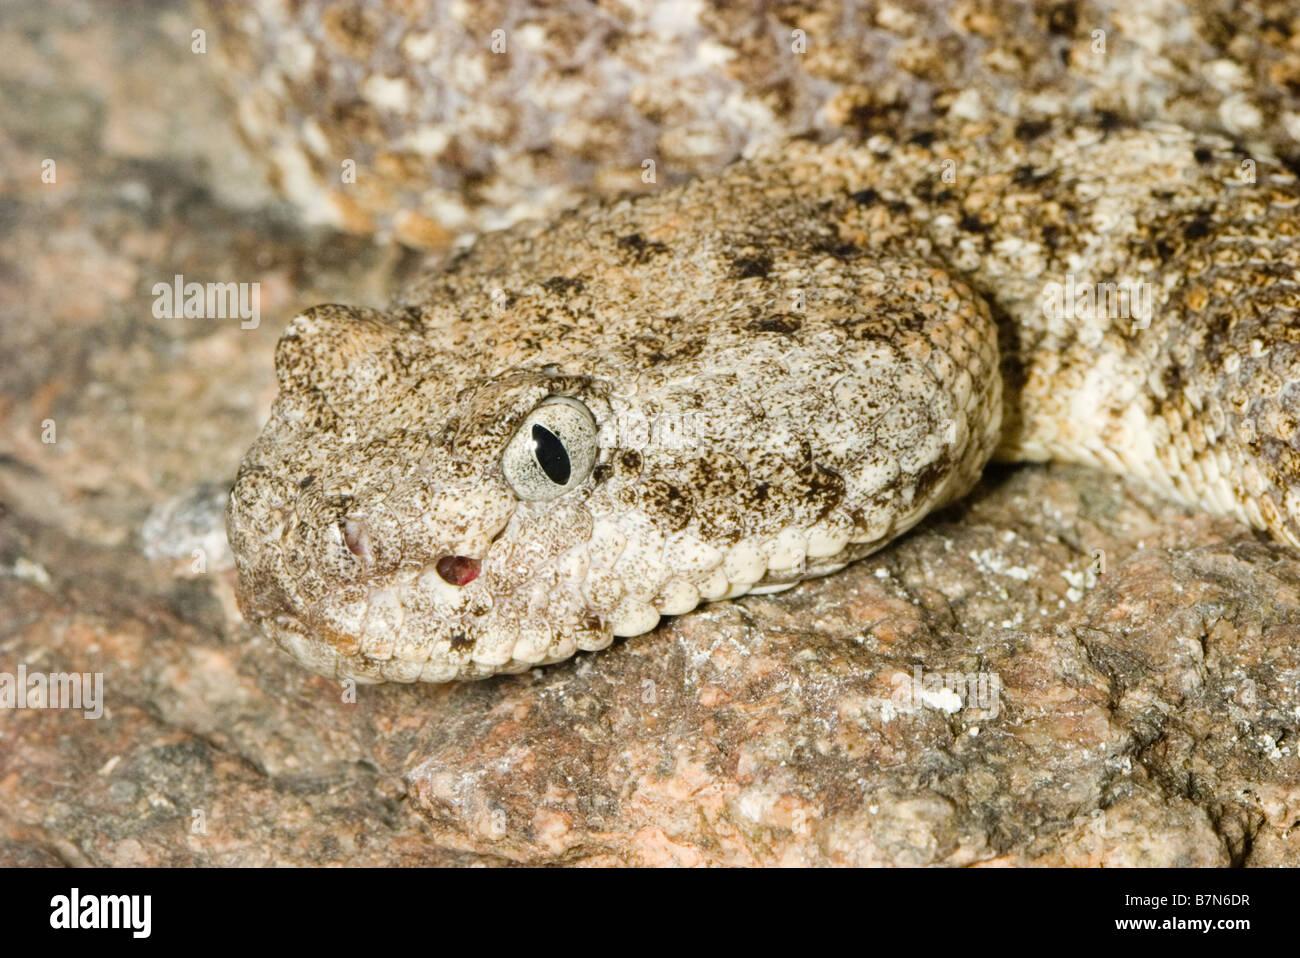 Rattlesnake Poison Stock Photos & Rattlesnake Poison Stock